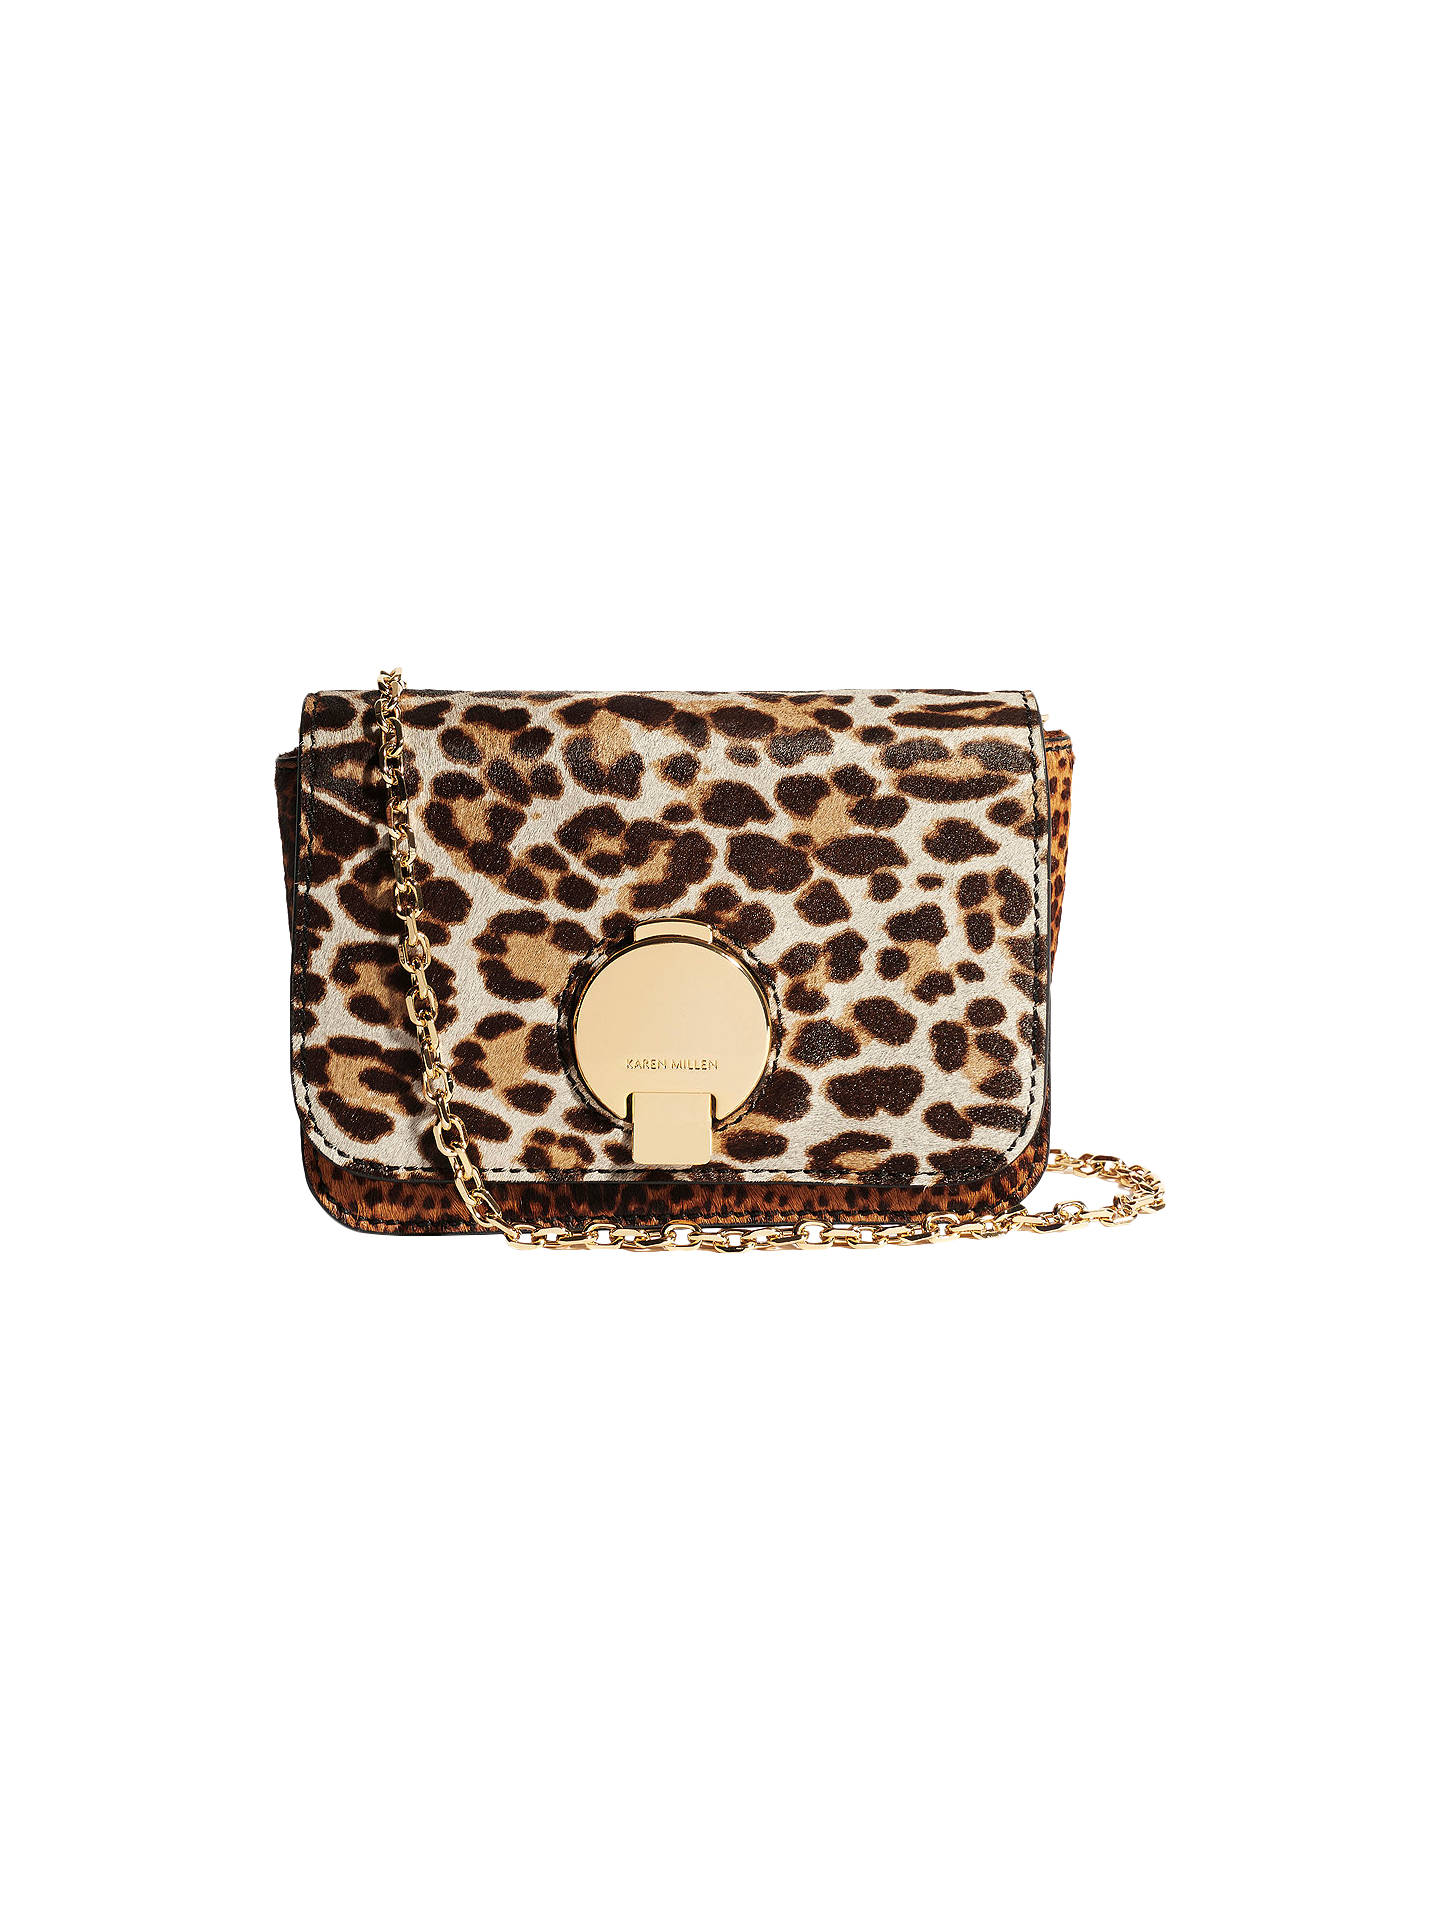 51e809197f5 Buy Karen Millen Leather Leopard Cross Body Bag, Multi Online at  johnlewis.com ...